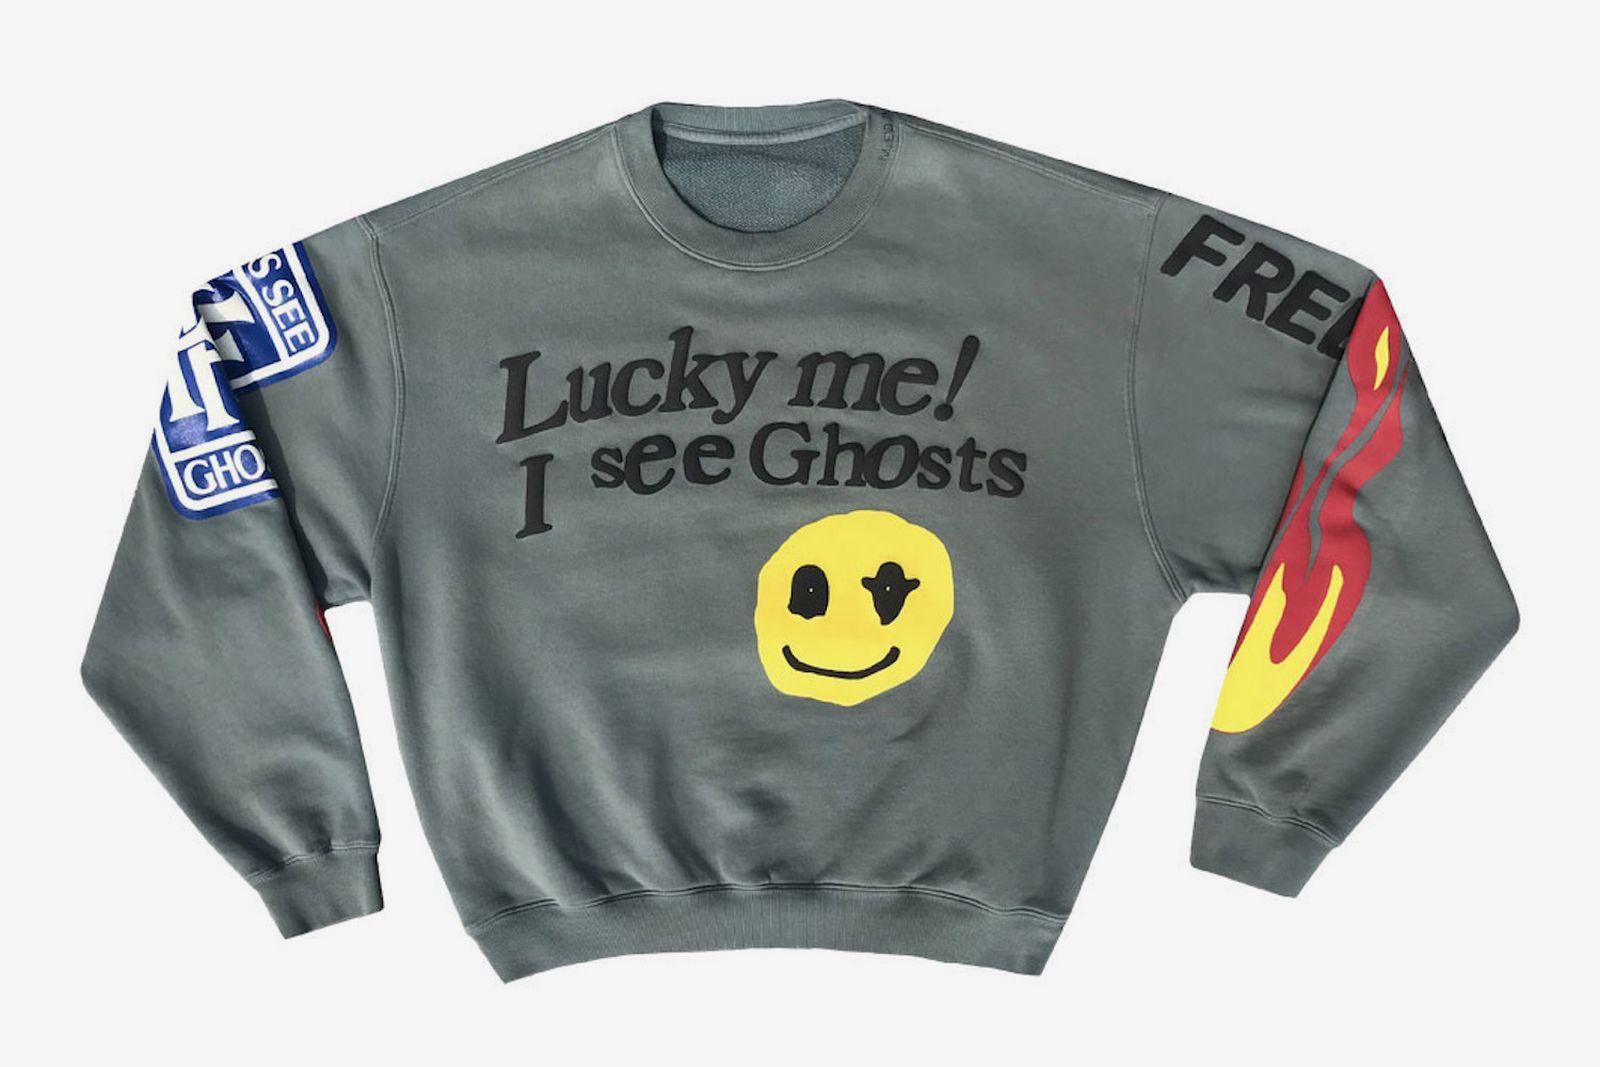 cactus plant flea market kids see ghosts sweatshirt